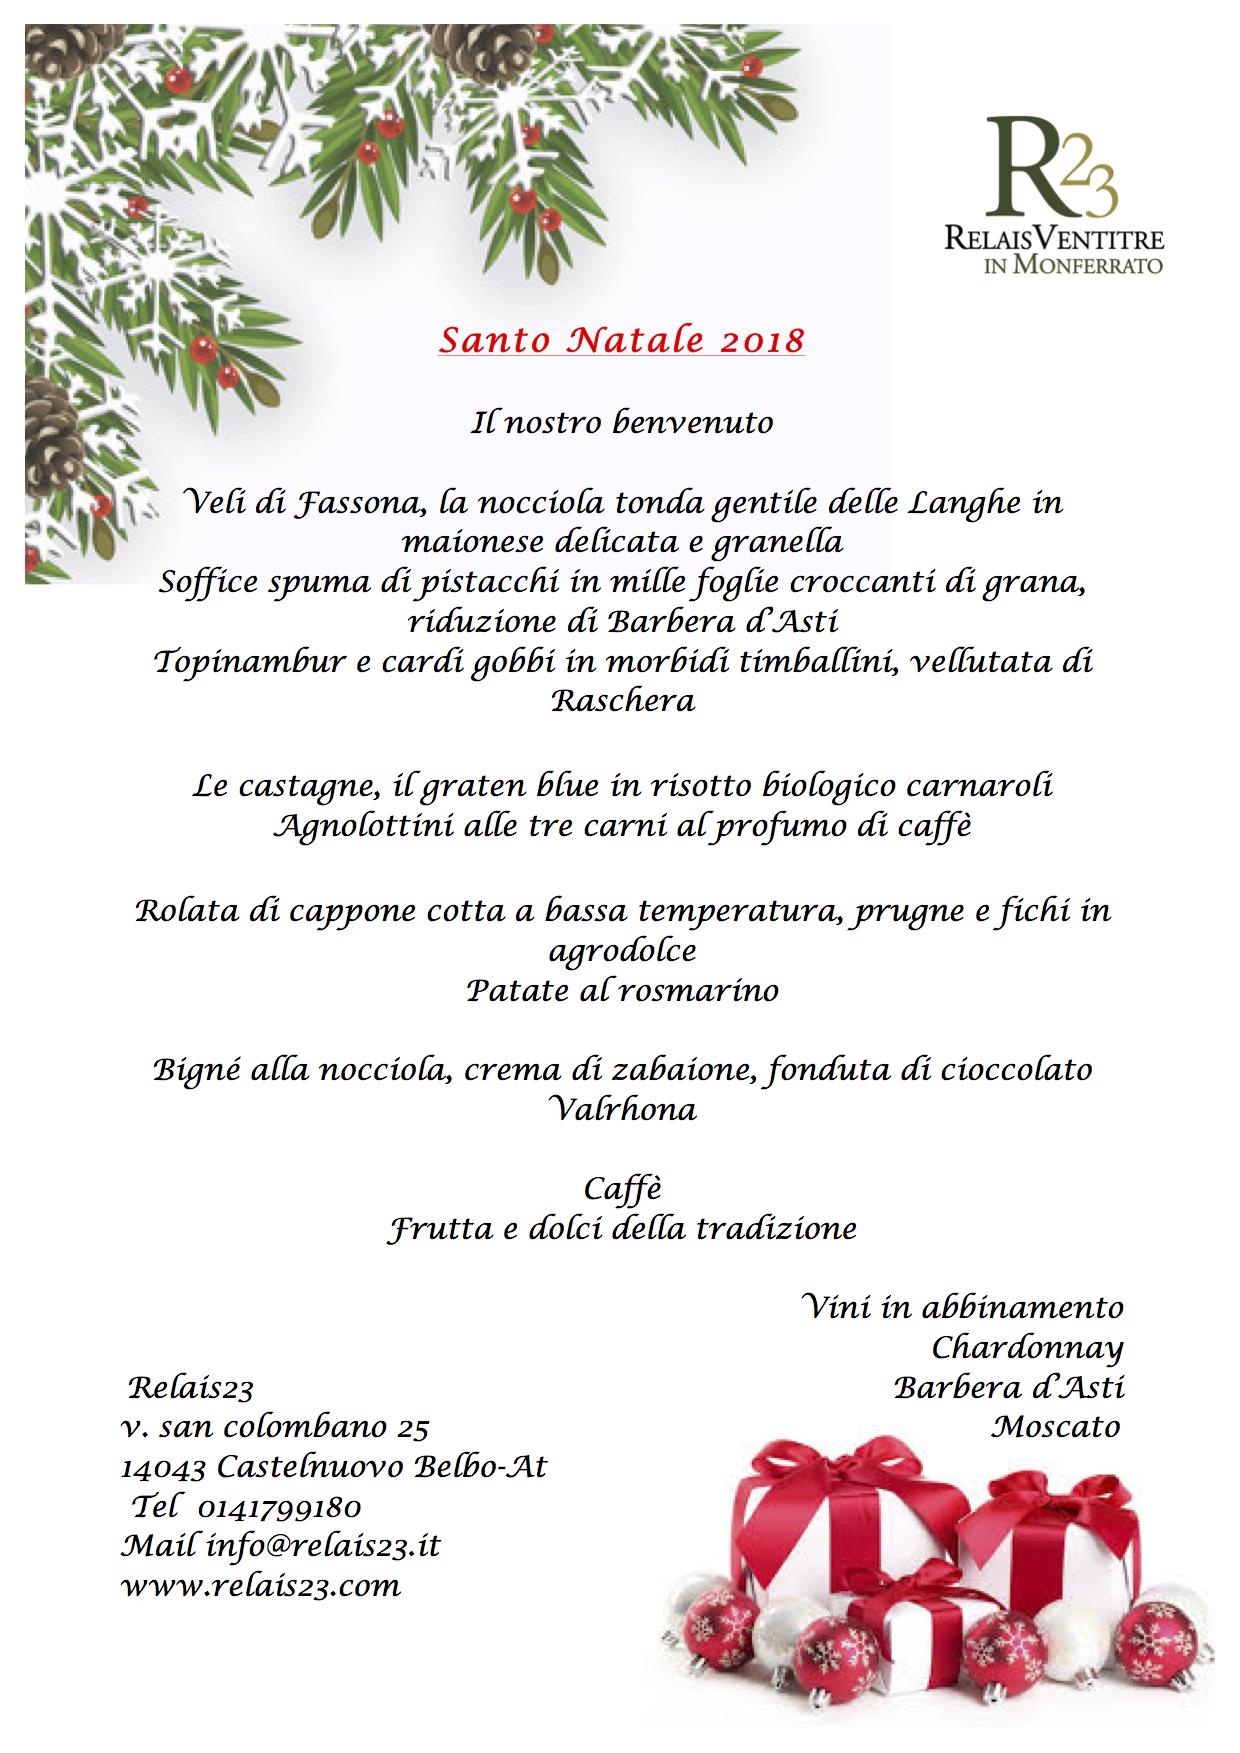 http://www.relais23.com/wp-content/uploads/2018/11/Santo-Natale-2018.jpg